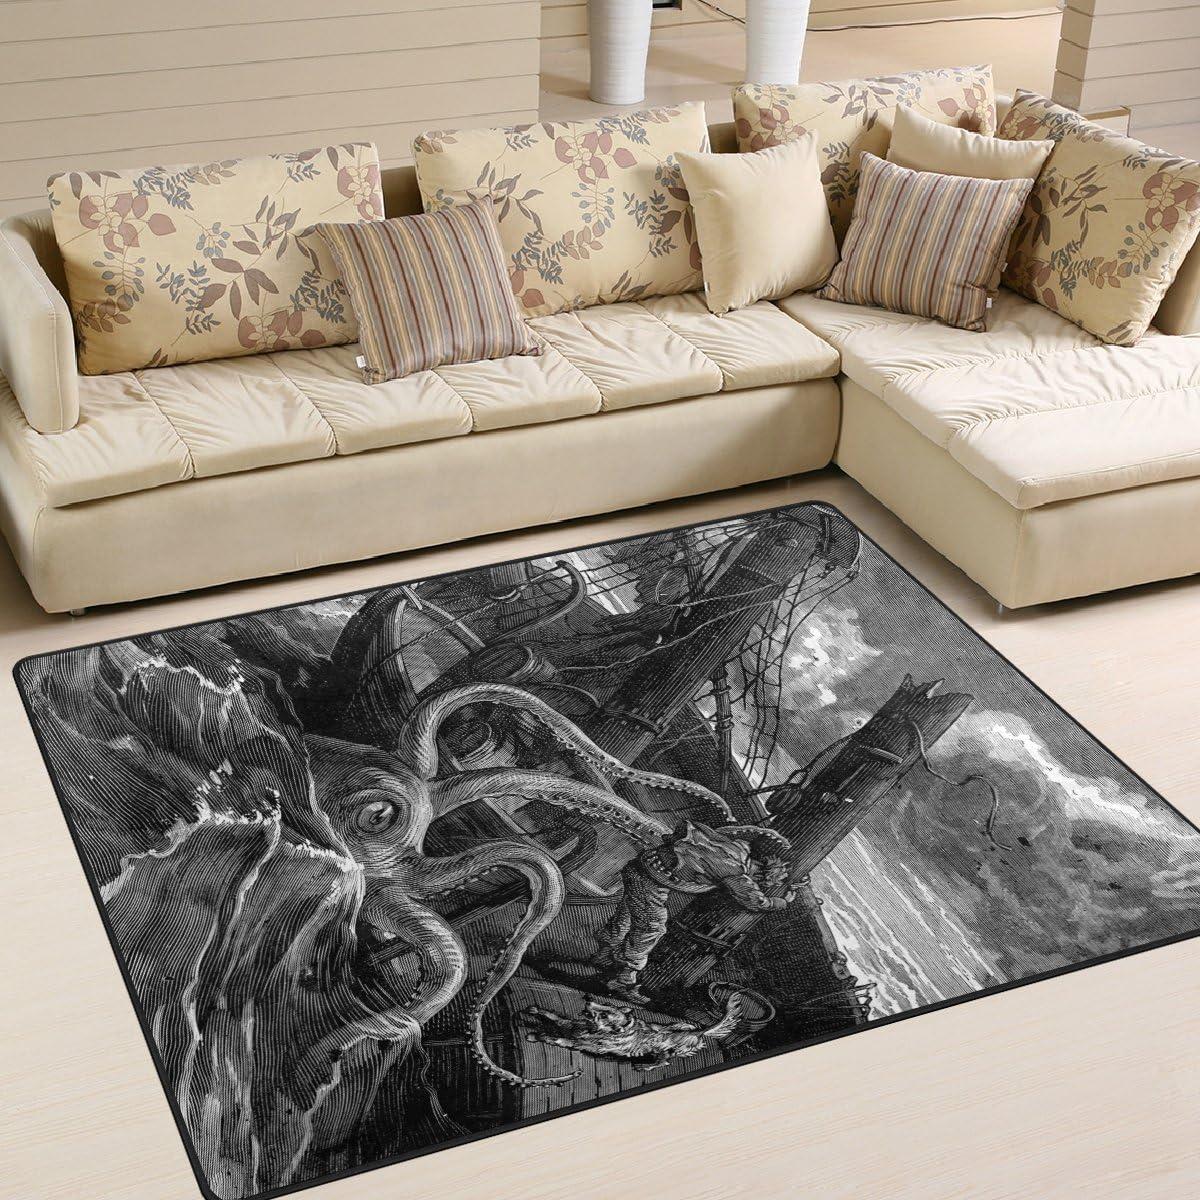 1.7 x 2.6 ft Ocean Sea Wave Nursery Rug Floor Carpet Yoga Mat Naanle Black and White Animal Octopus Non Slip Area Rug for Living Dinning Room Bedroom Kitchen 50 x 80 cm